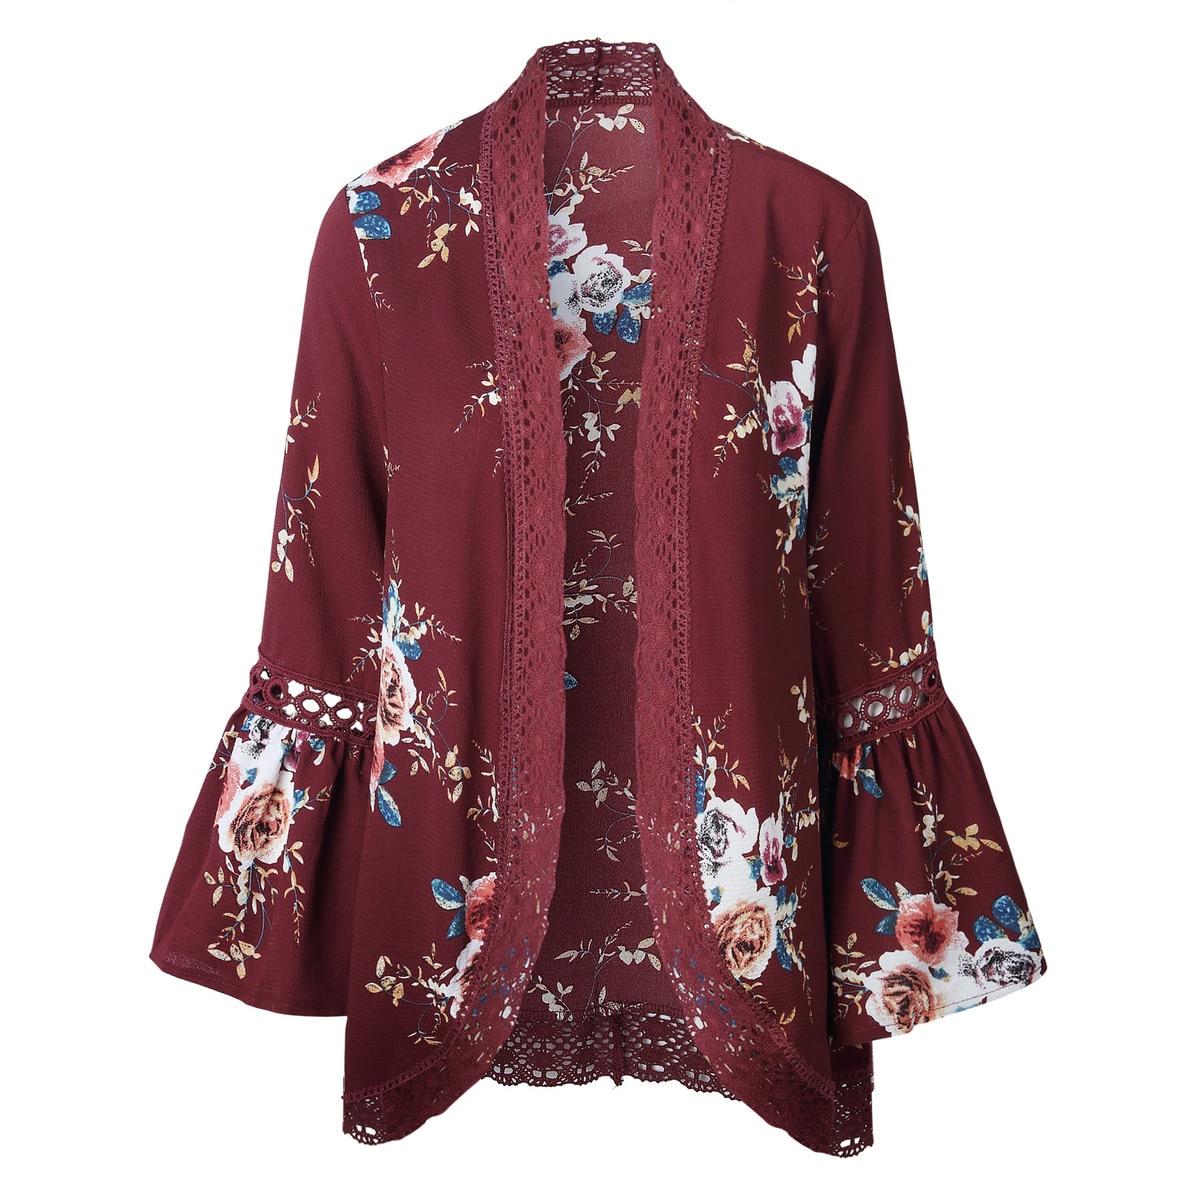 HTB1ZRk7kSMmBKNjSZTEq6ysKpXaV Women Plus Size Loose Casual Basic Jackets Female 2018 Autumn Long Flare Sleeve Floral Print Outwear Coat Open Stitch Clothing